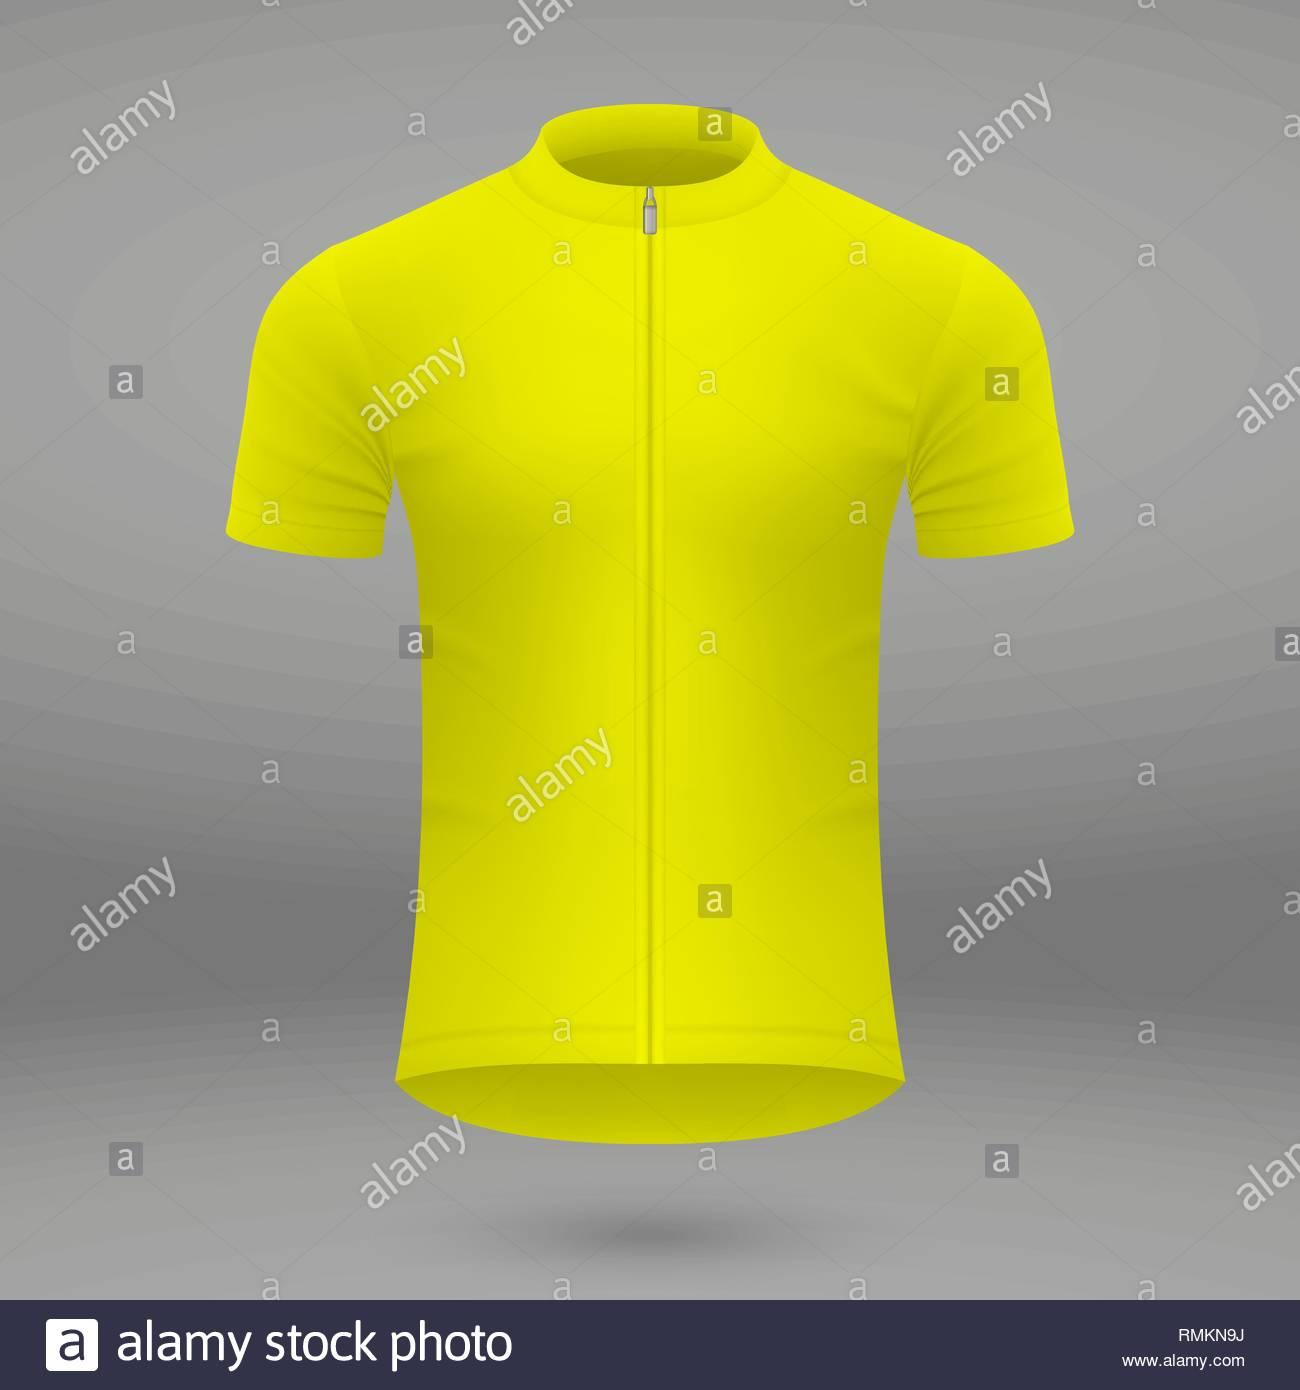 Cycling Shirt Template